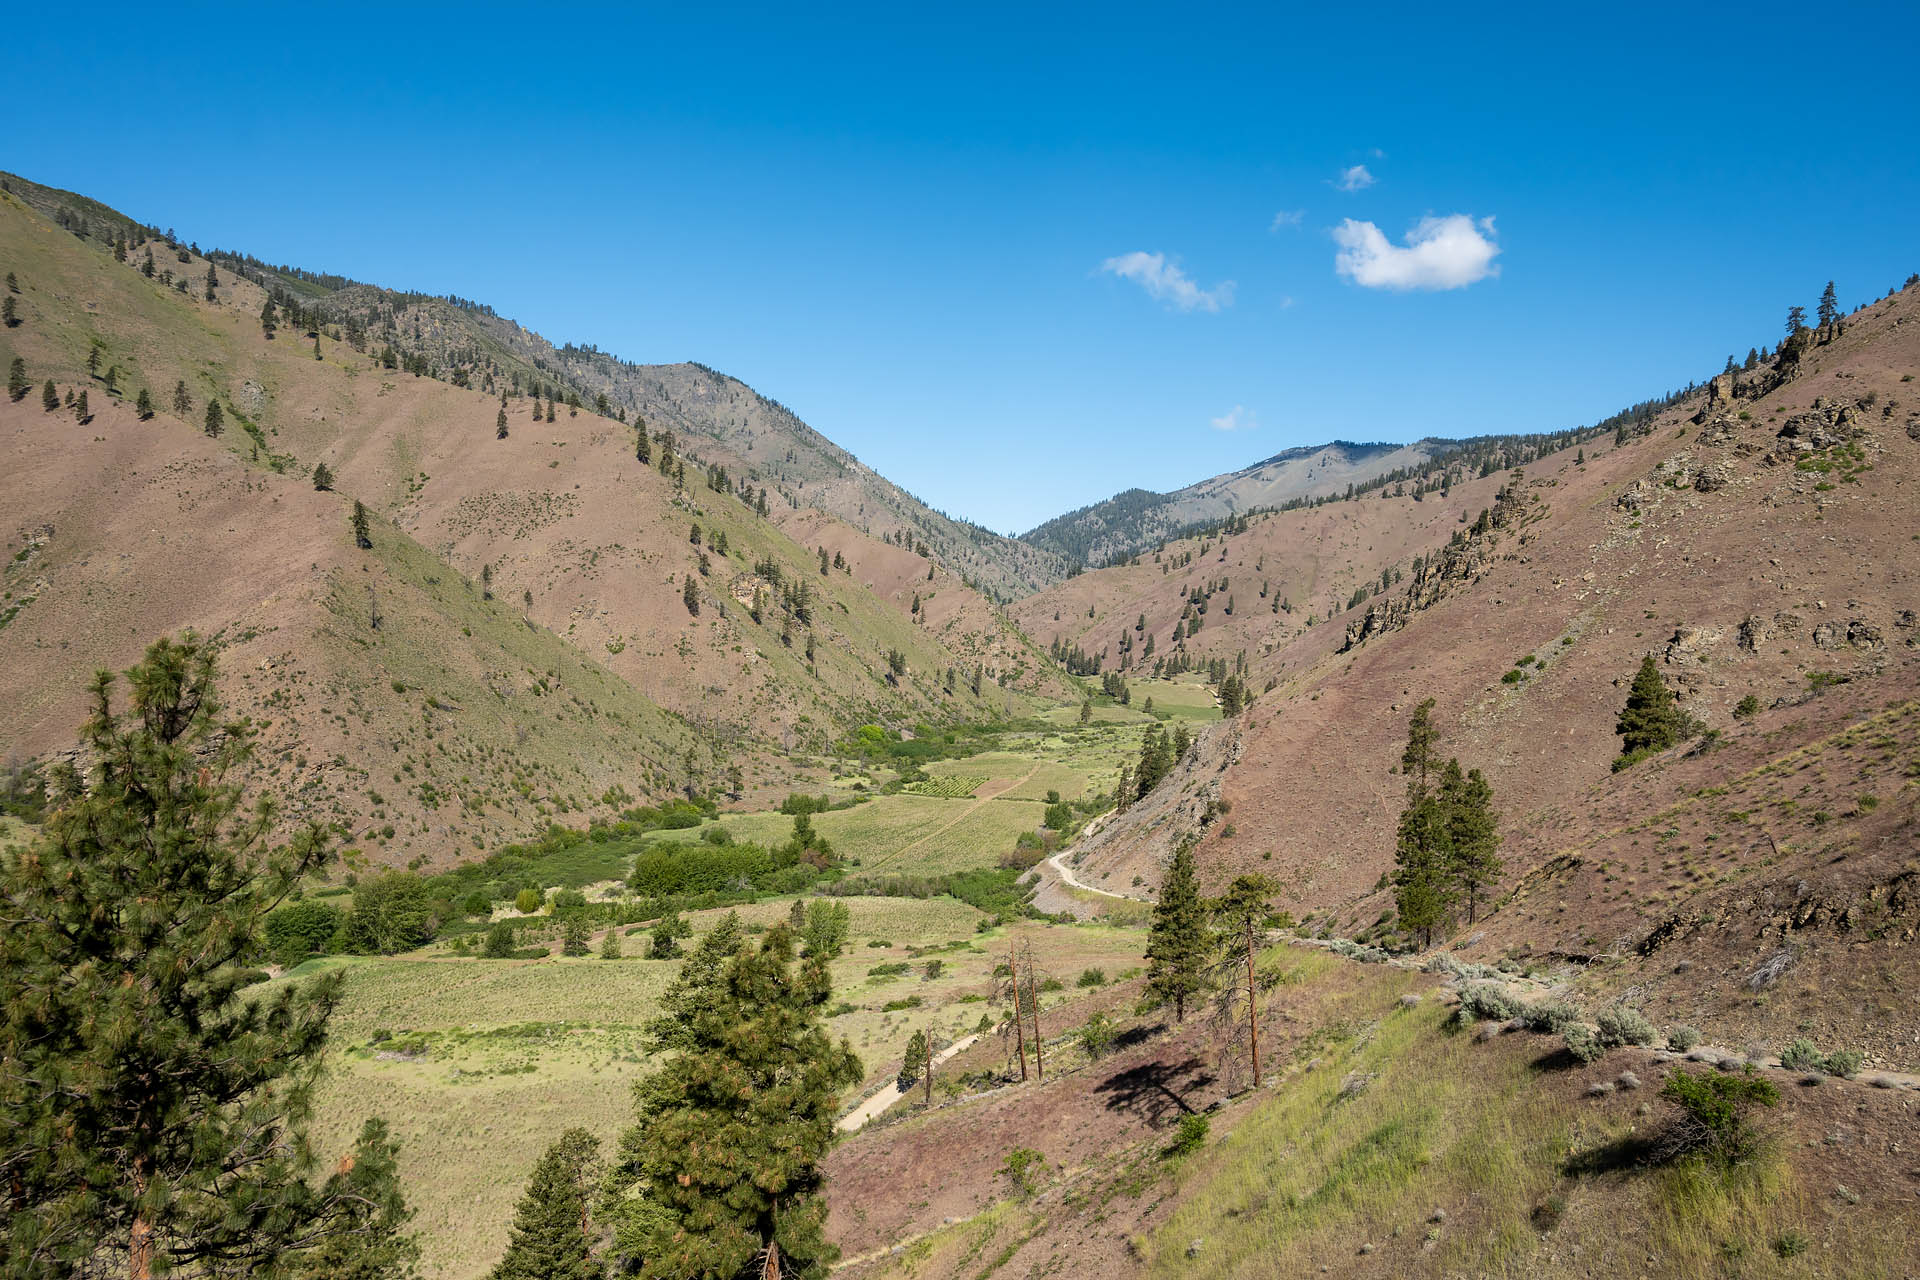 Swakane Canyon